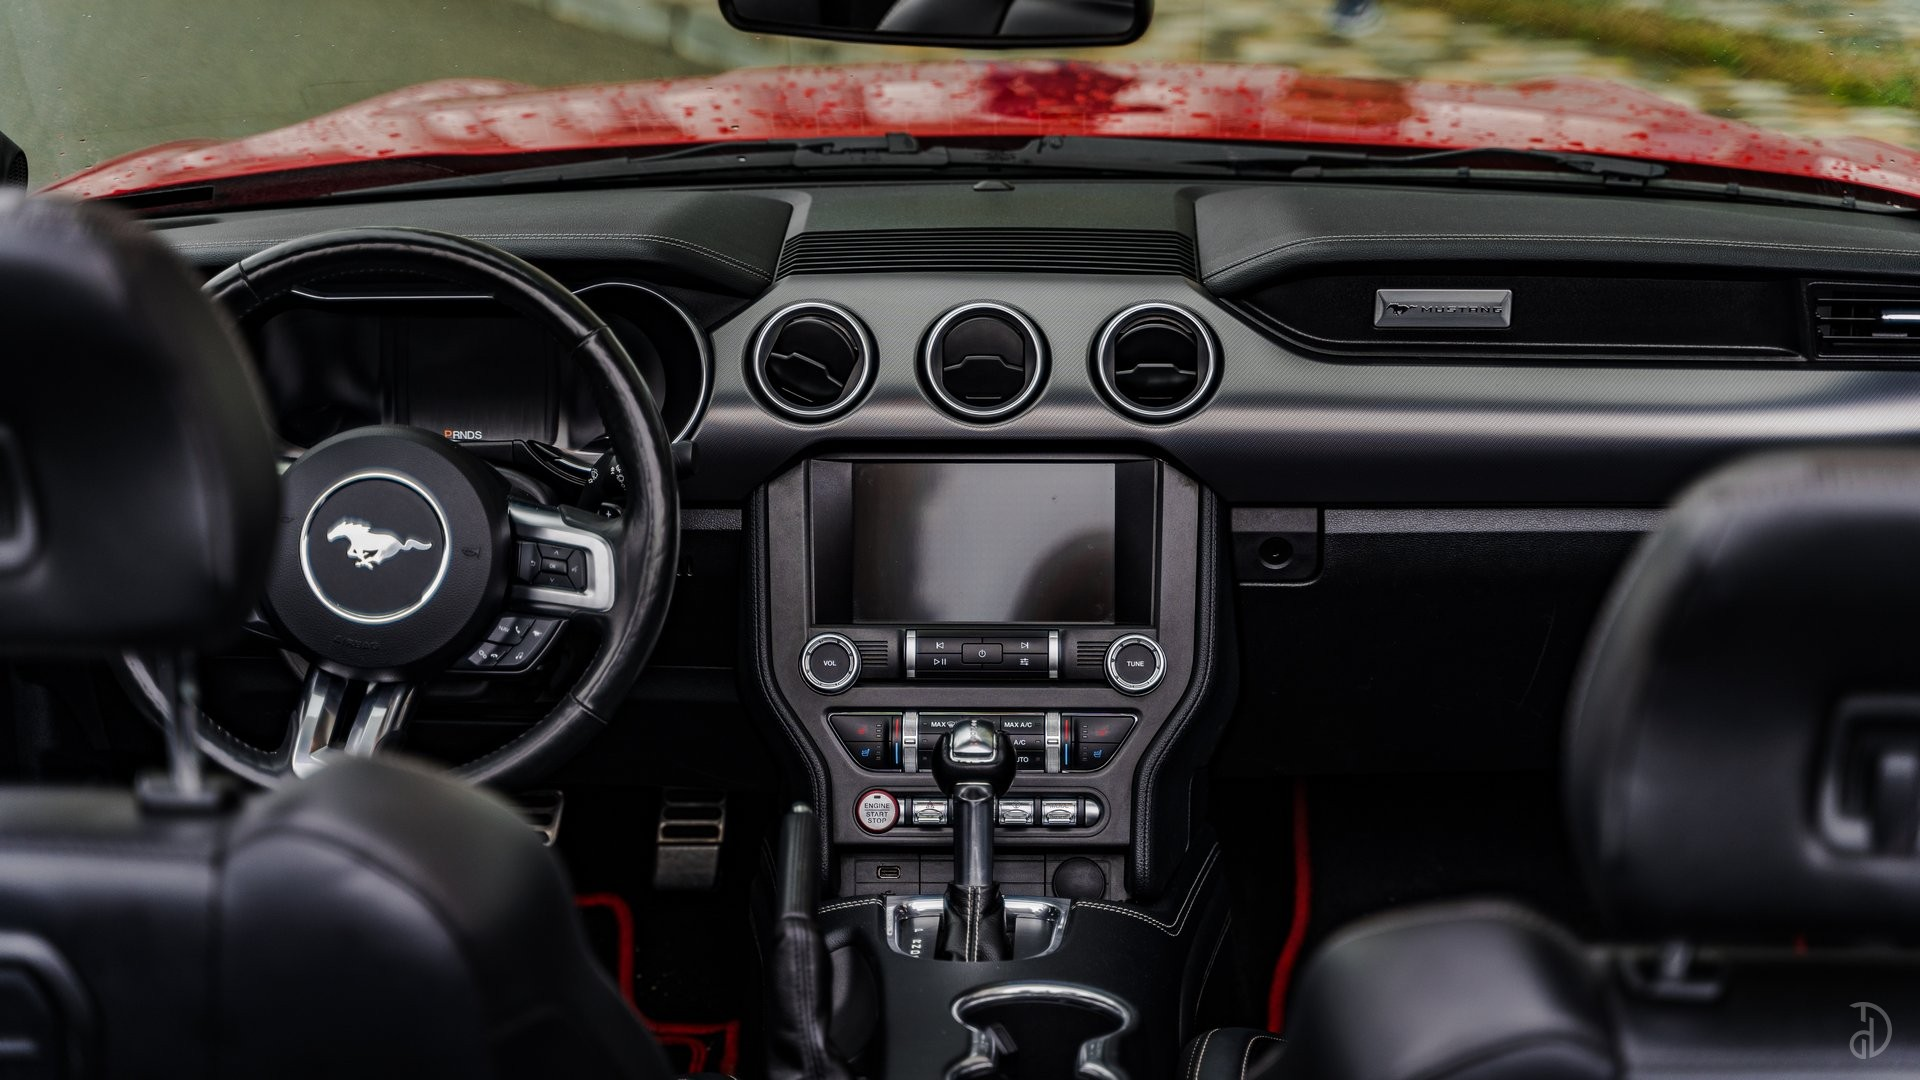 Аренда Ford Mustang GT 5.0 в Сочи. Фото 8